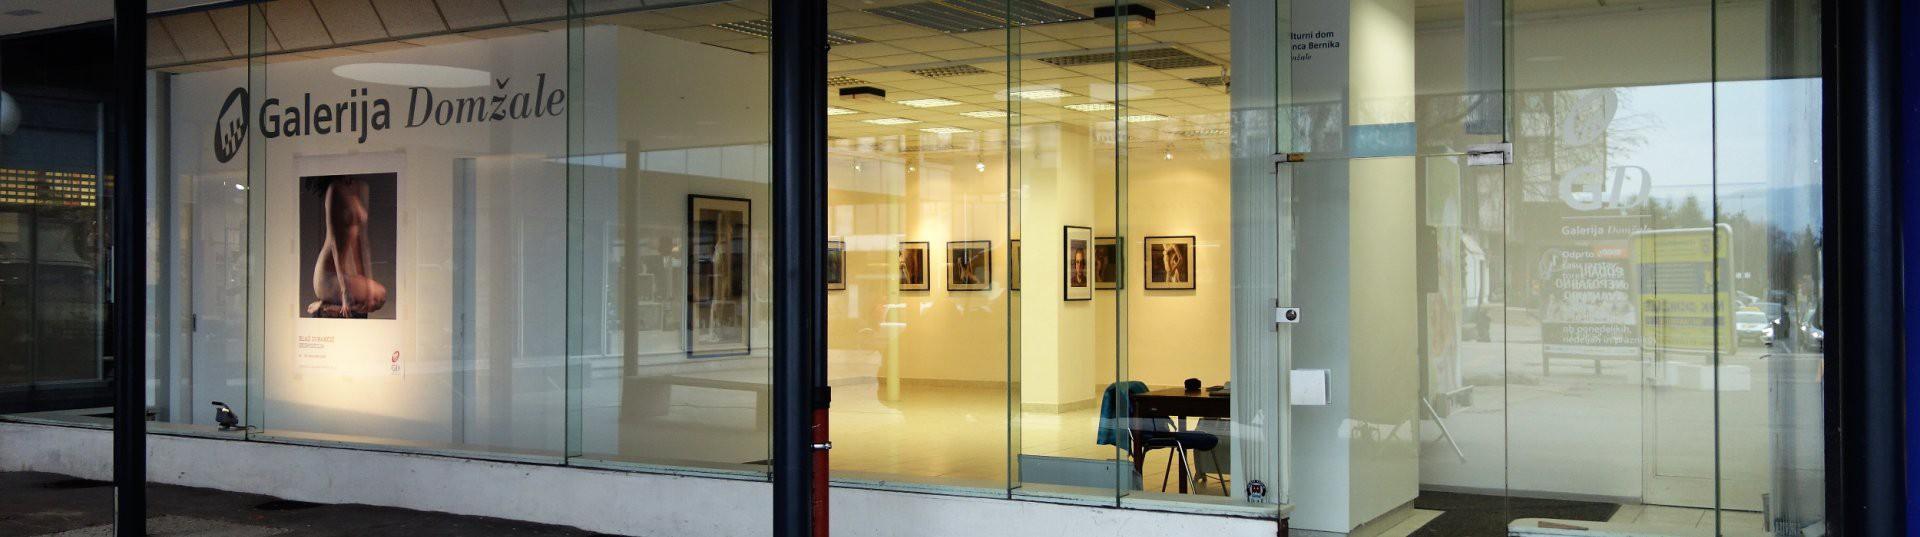 Galerija Domžale